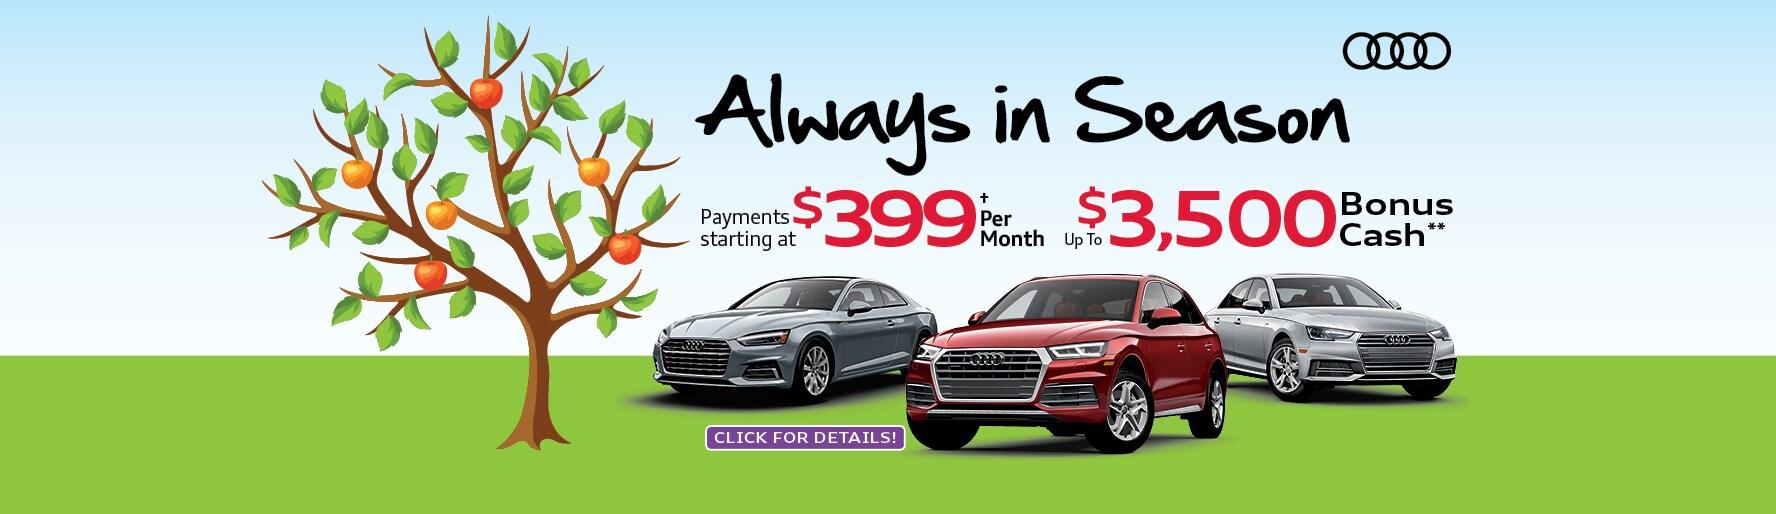 New Used Audi Cars Audi Lynbrook NY Audi Dealer - South hills audi